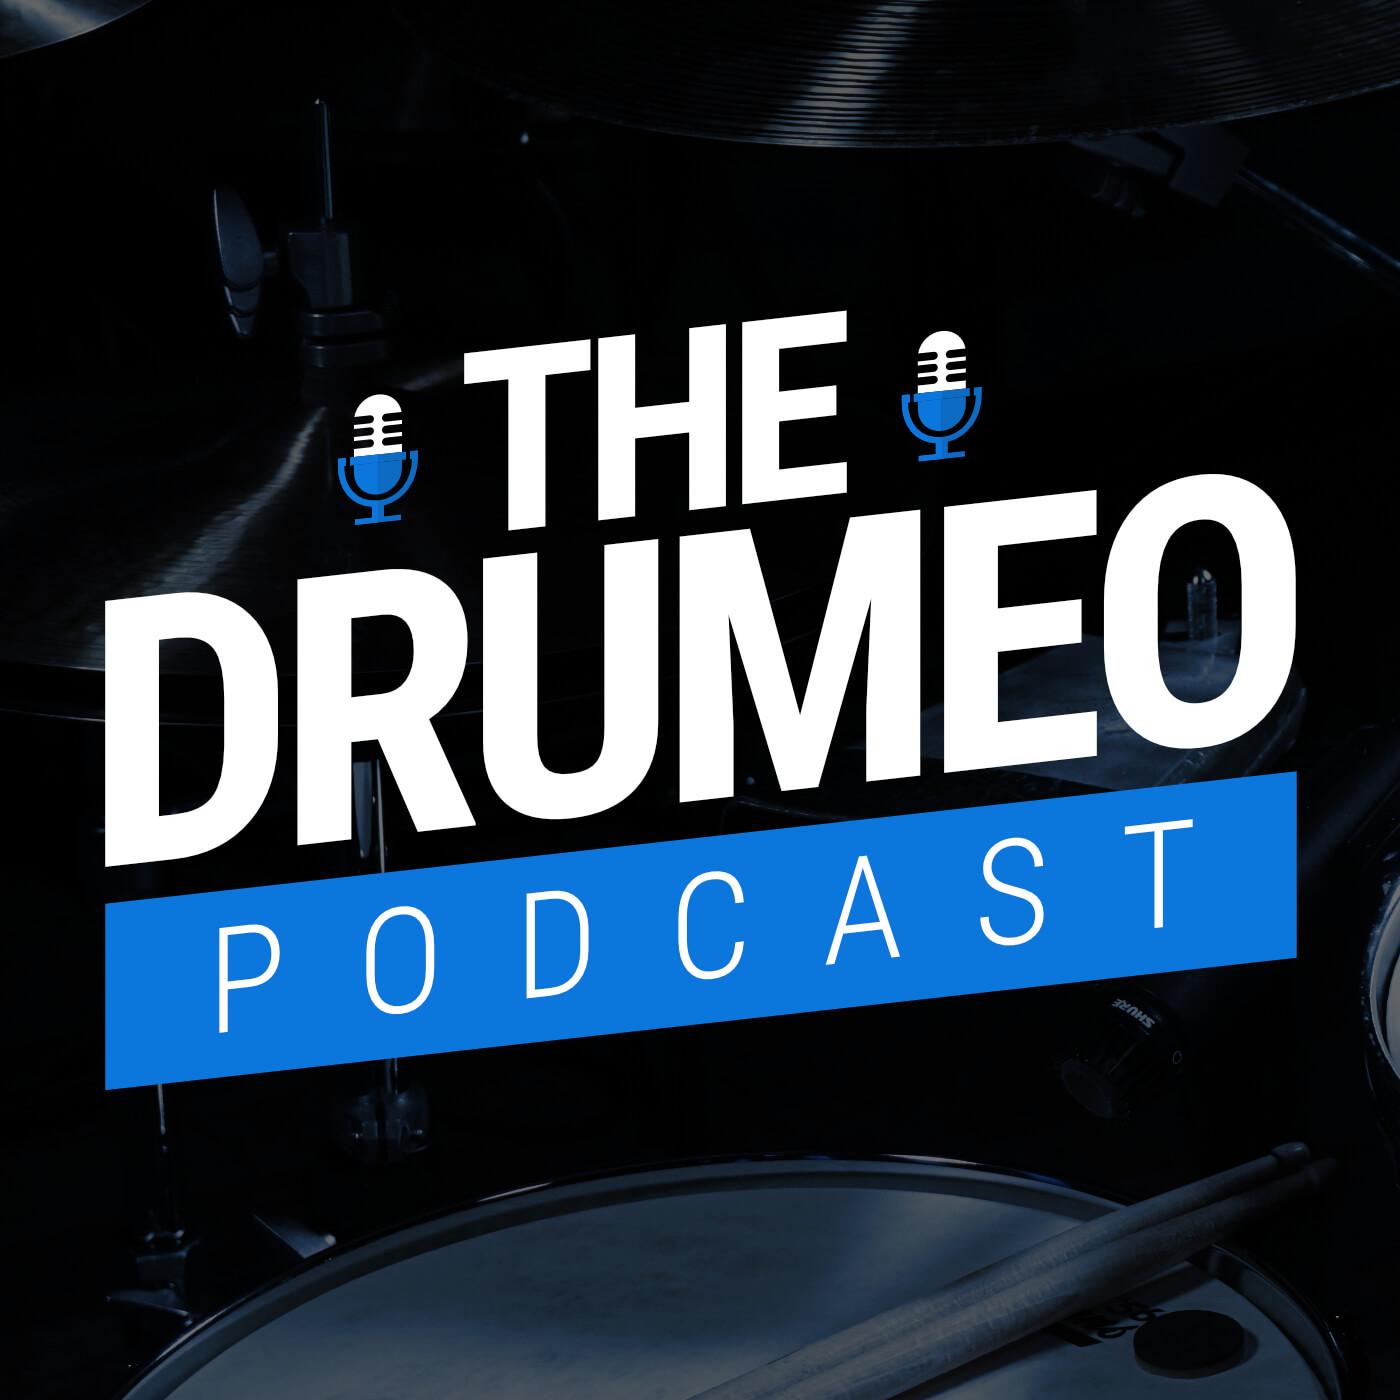 Drumeo Podcast show art